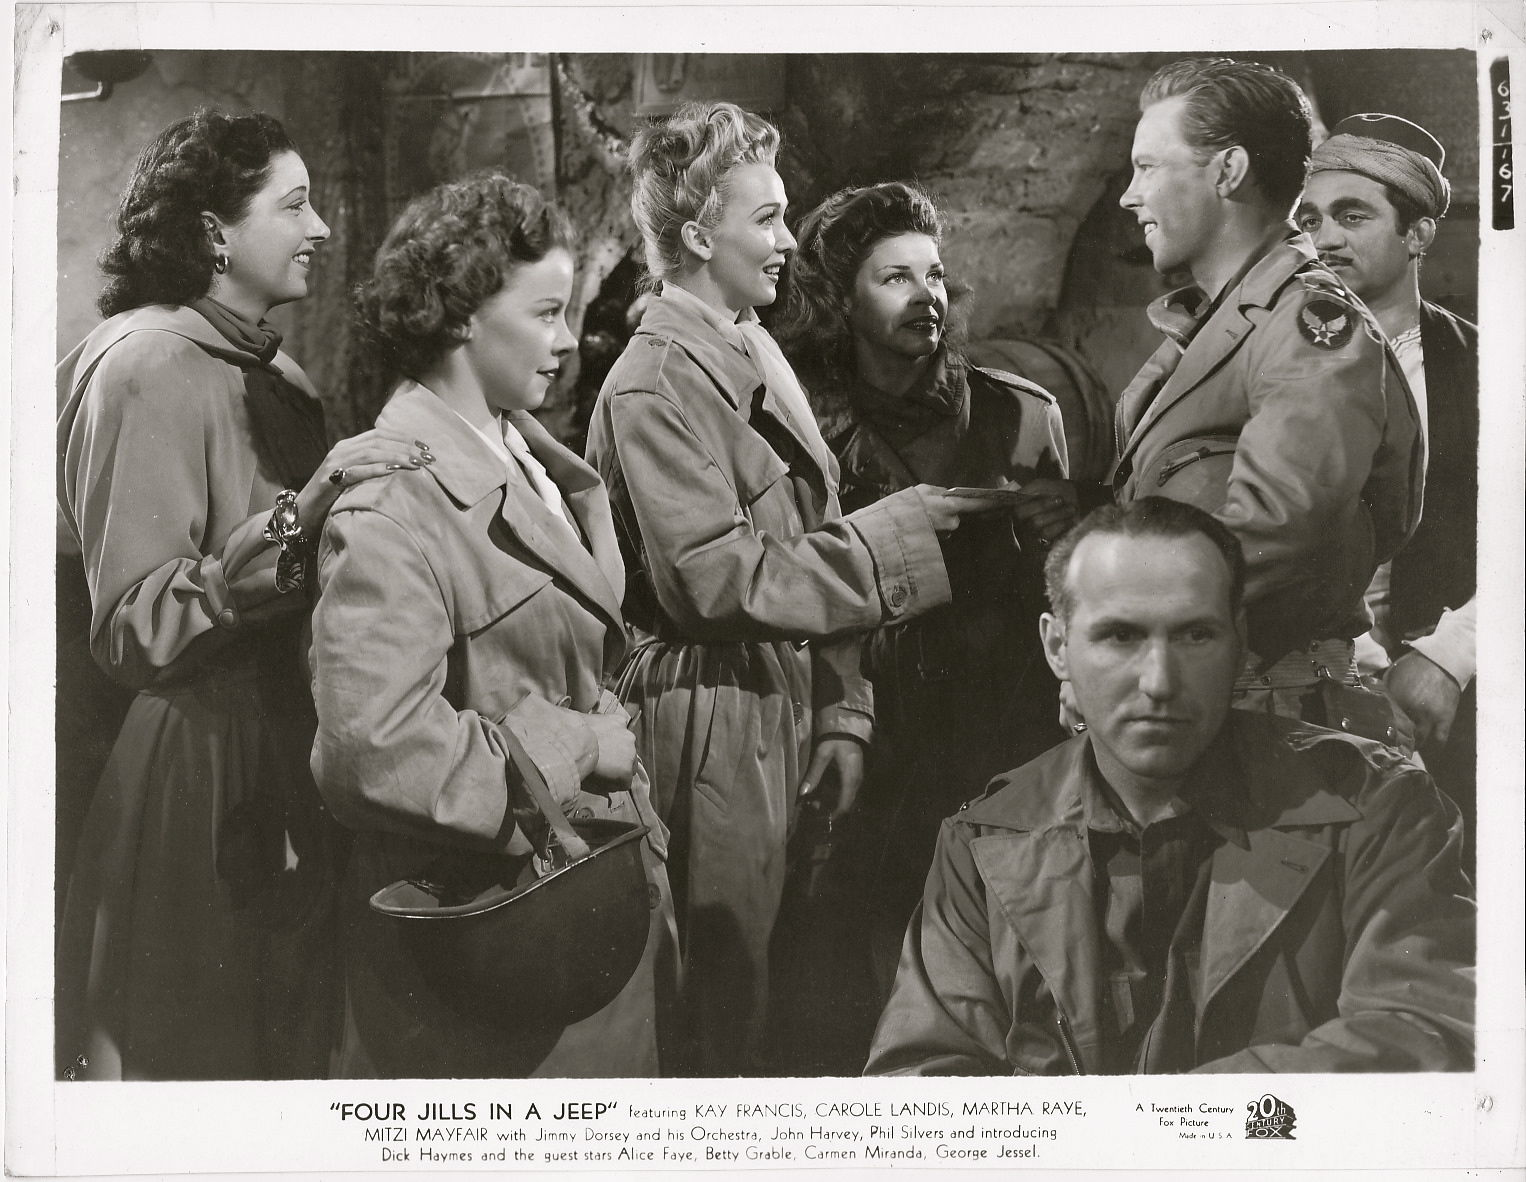 Kay Francis, Dick Haymes, Carole Landis, Mitzi Mayfair, and Martha Raye in Four Jills in a Jeep (1944)